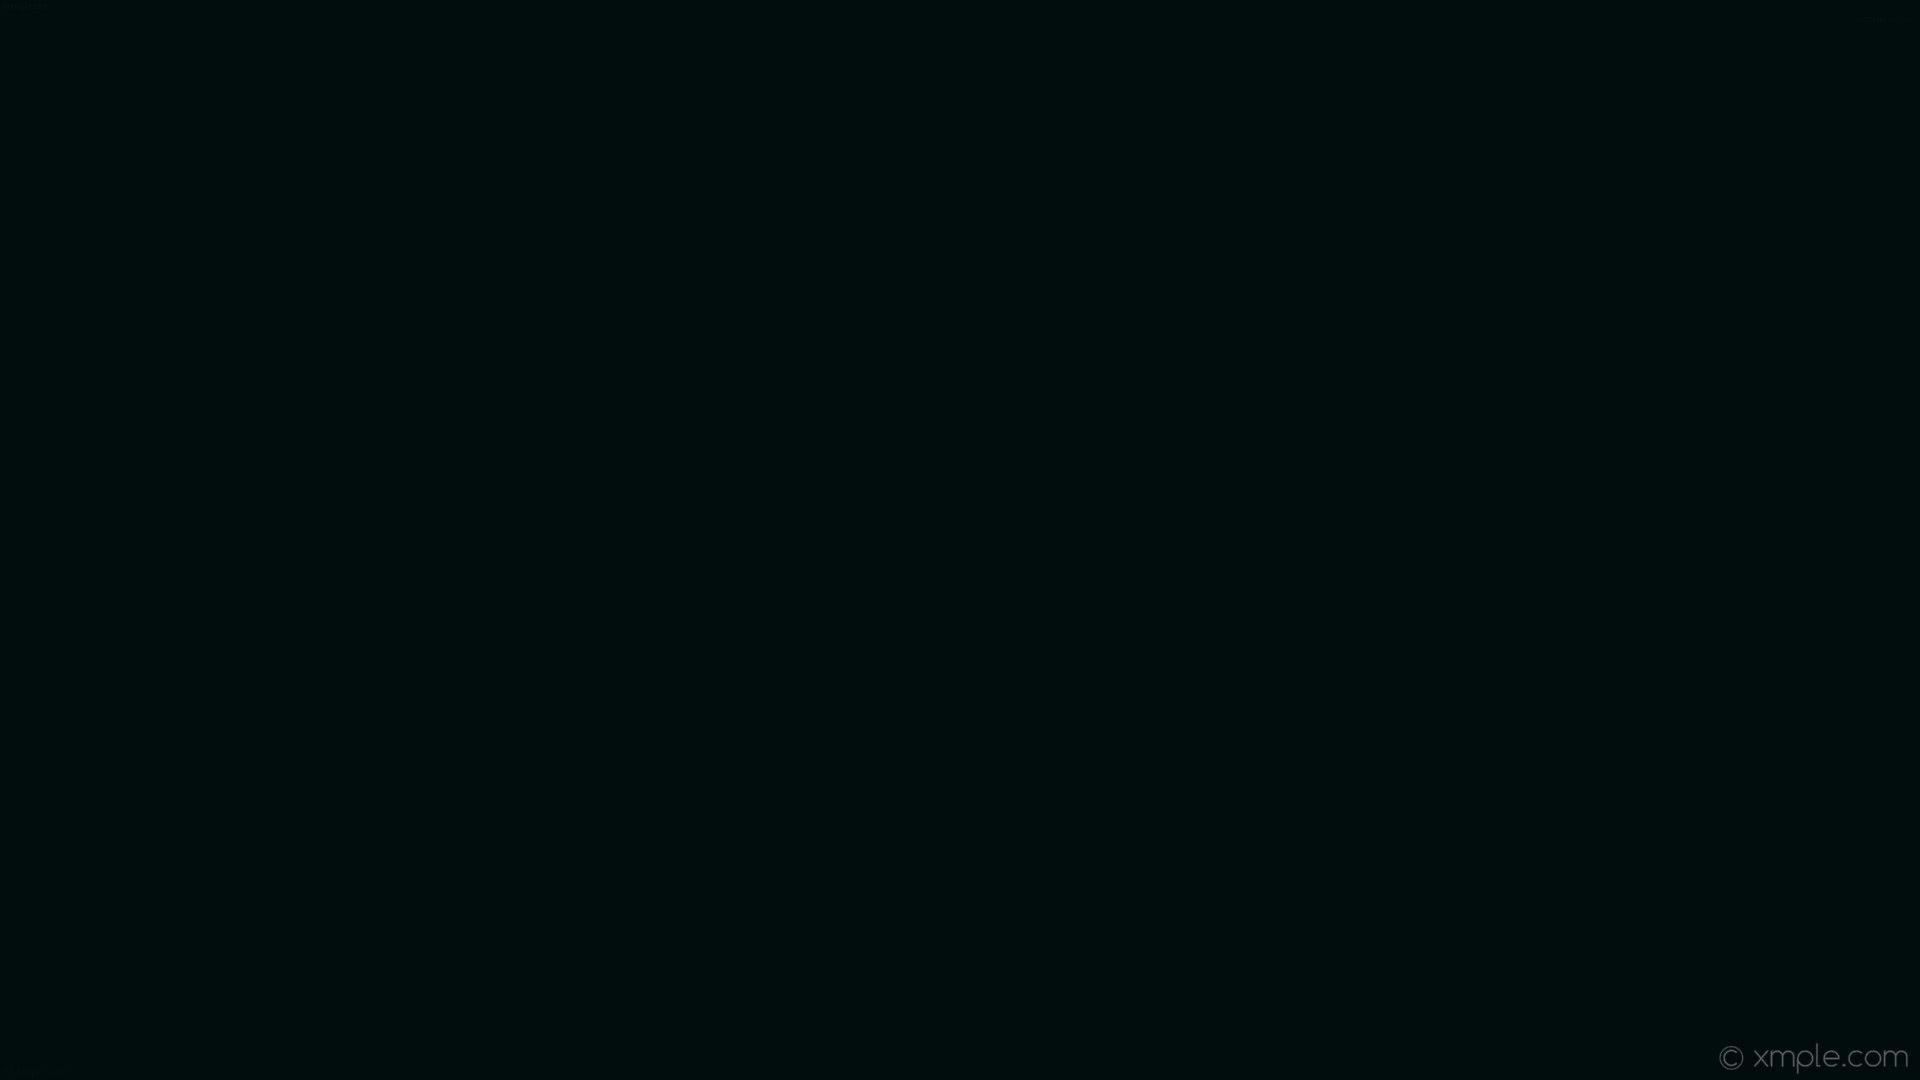 Solid Black Desktop Wallpapers On Wallpaperdog